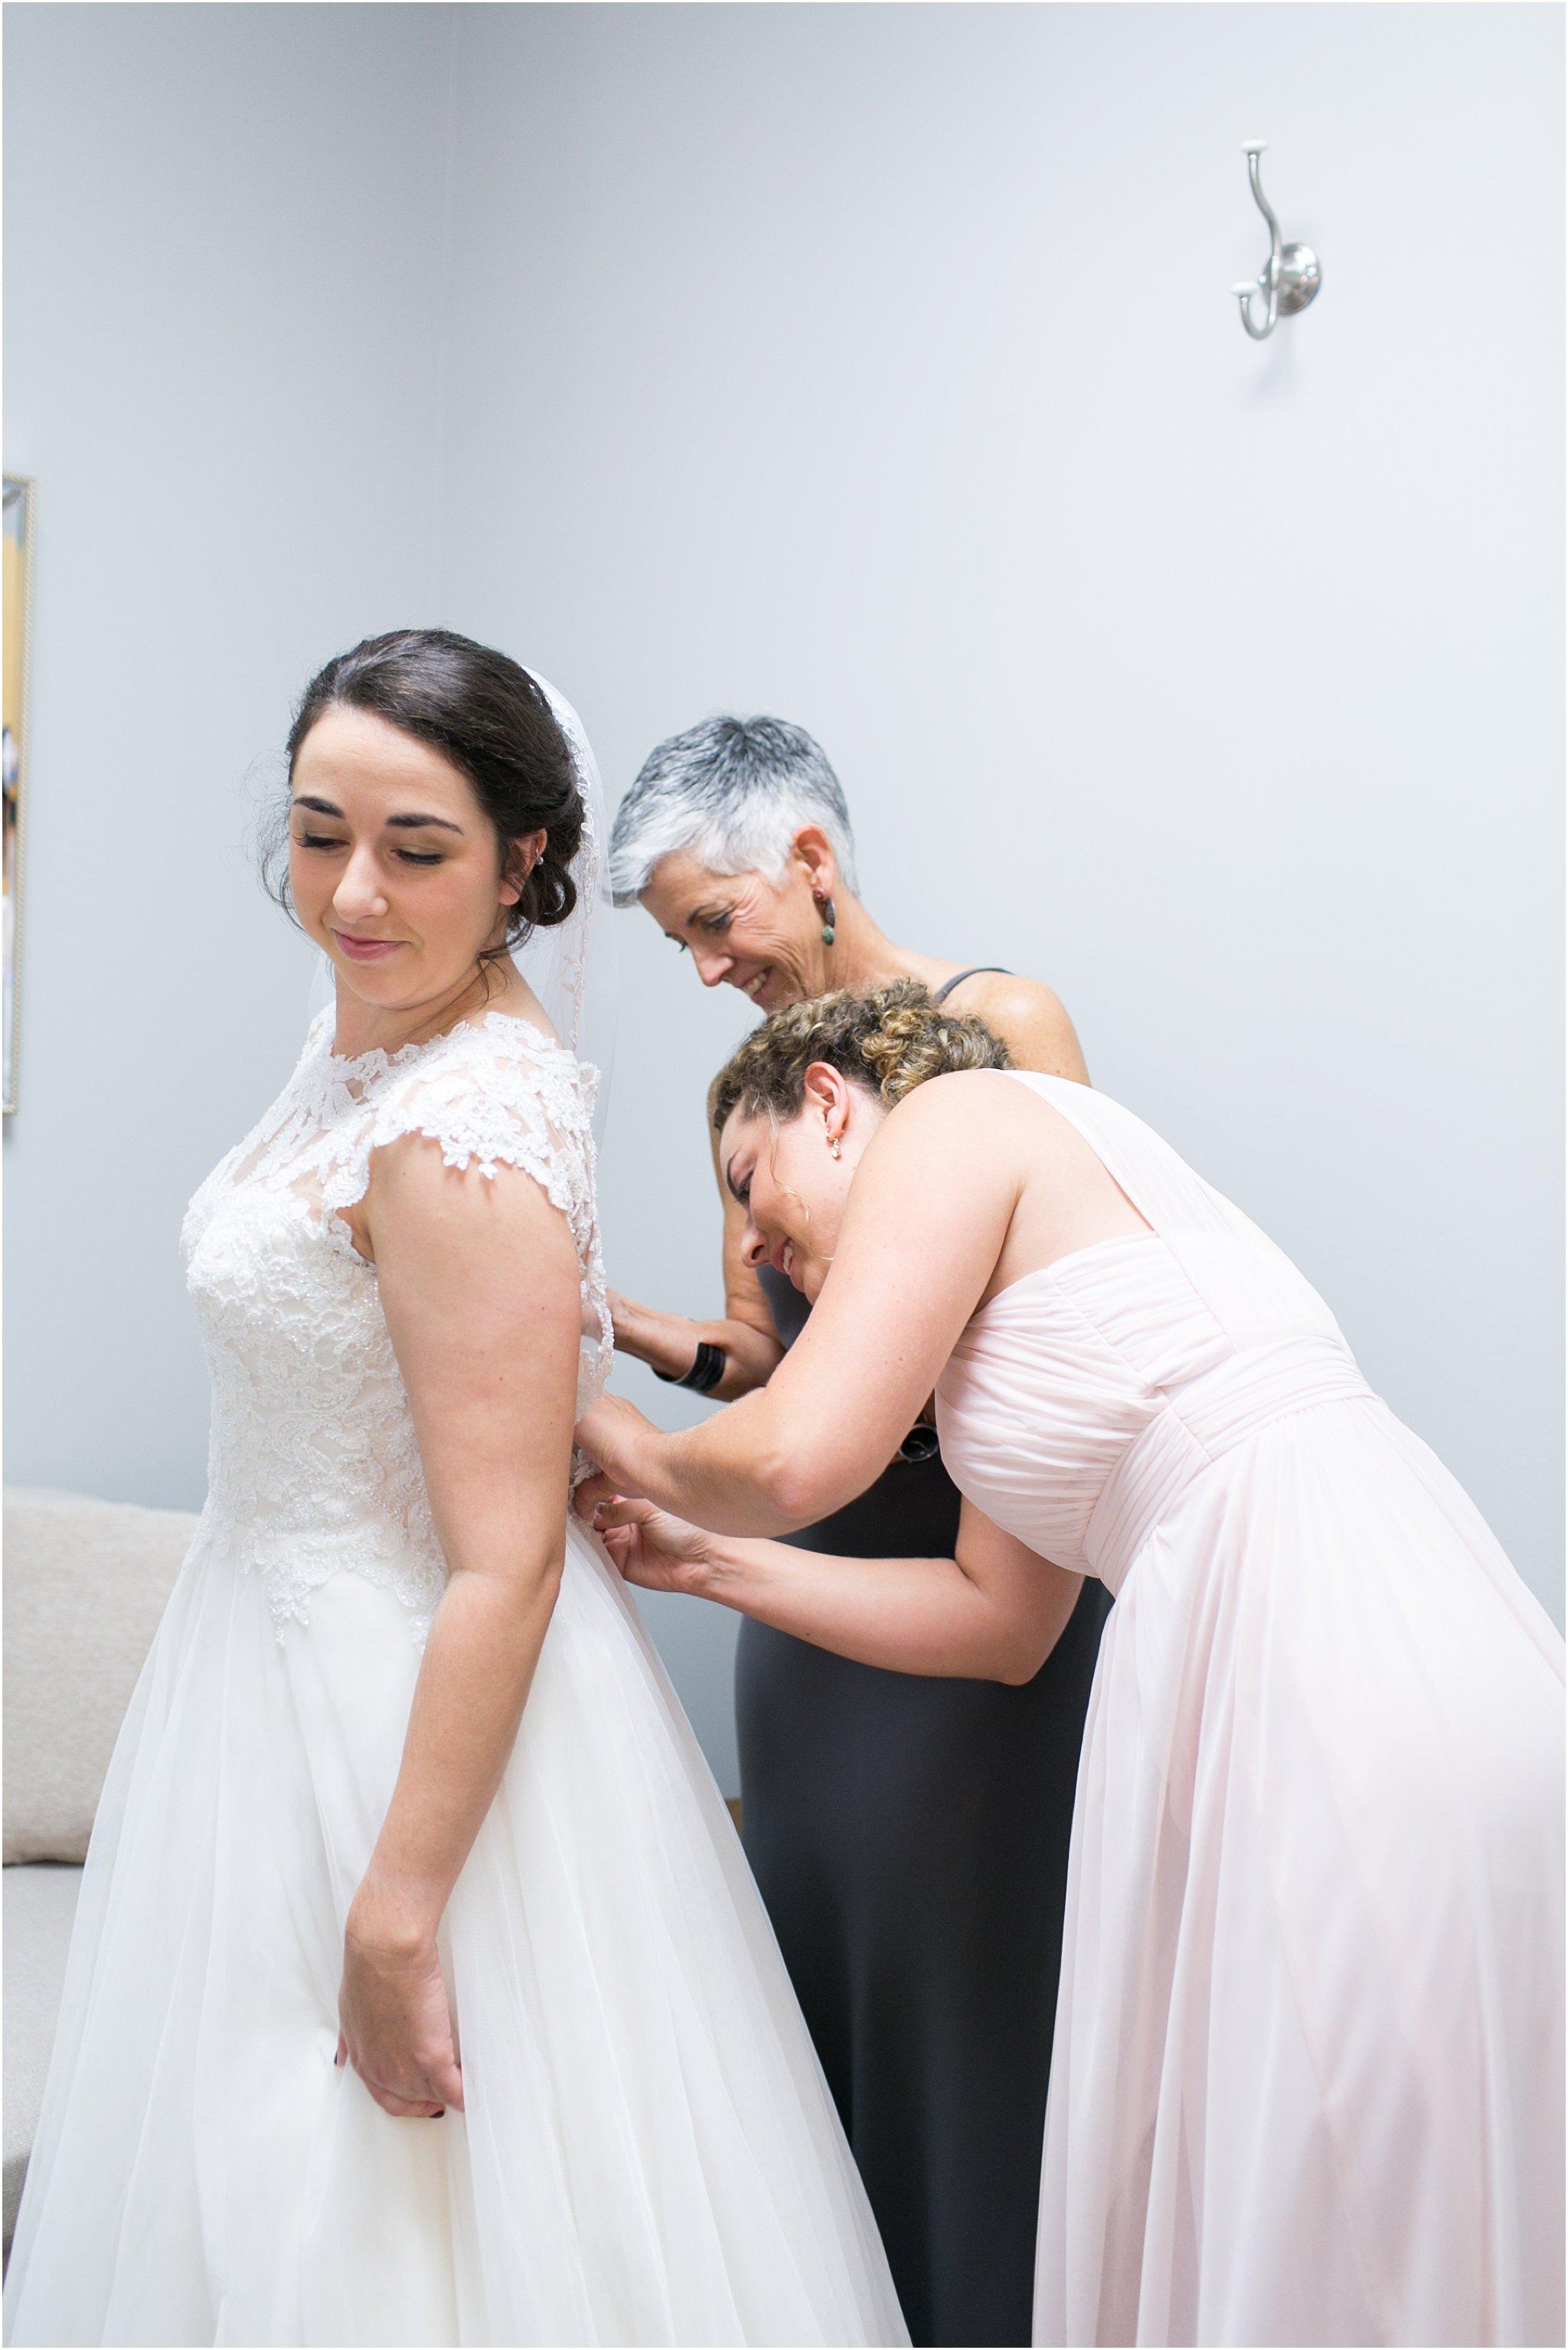 jessica_ryan_photography_virginia_wedding_photographer_wedding_hurricane_norfolk_botanical_gardens_hurricane_matthew_wedding_3550